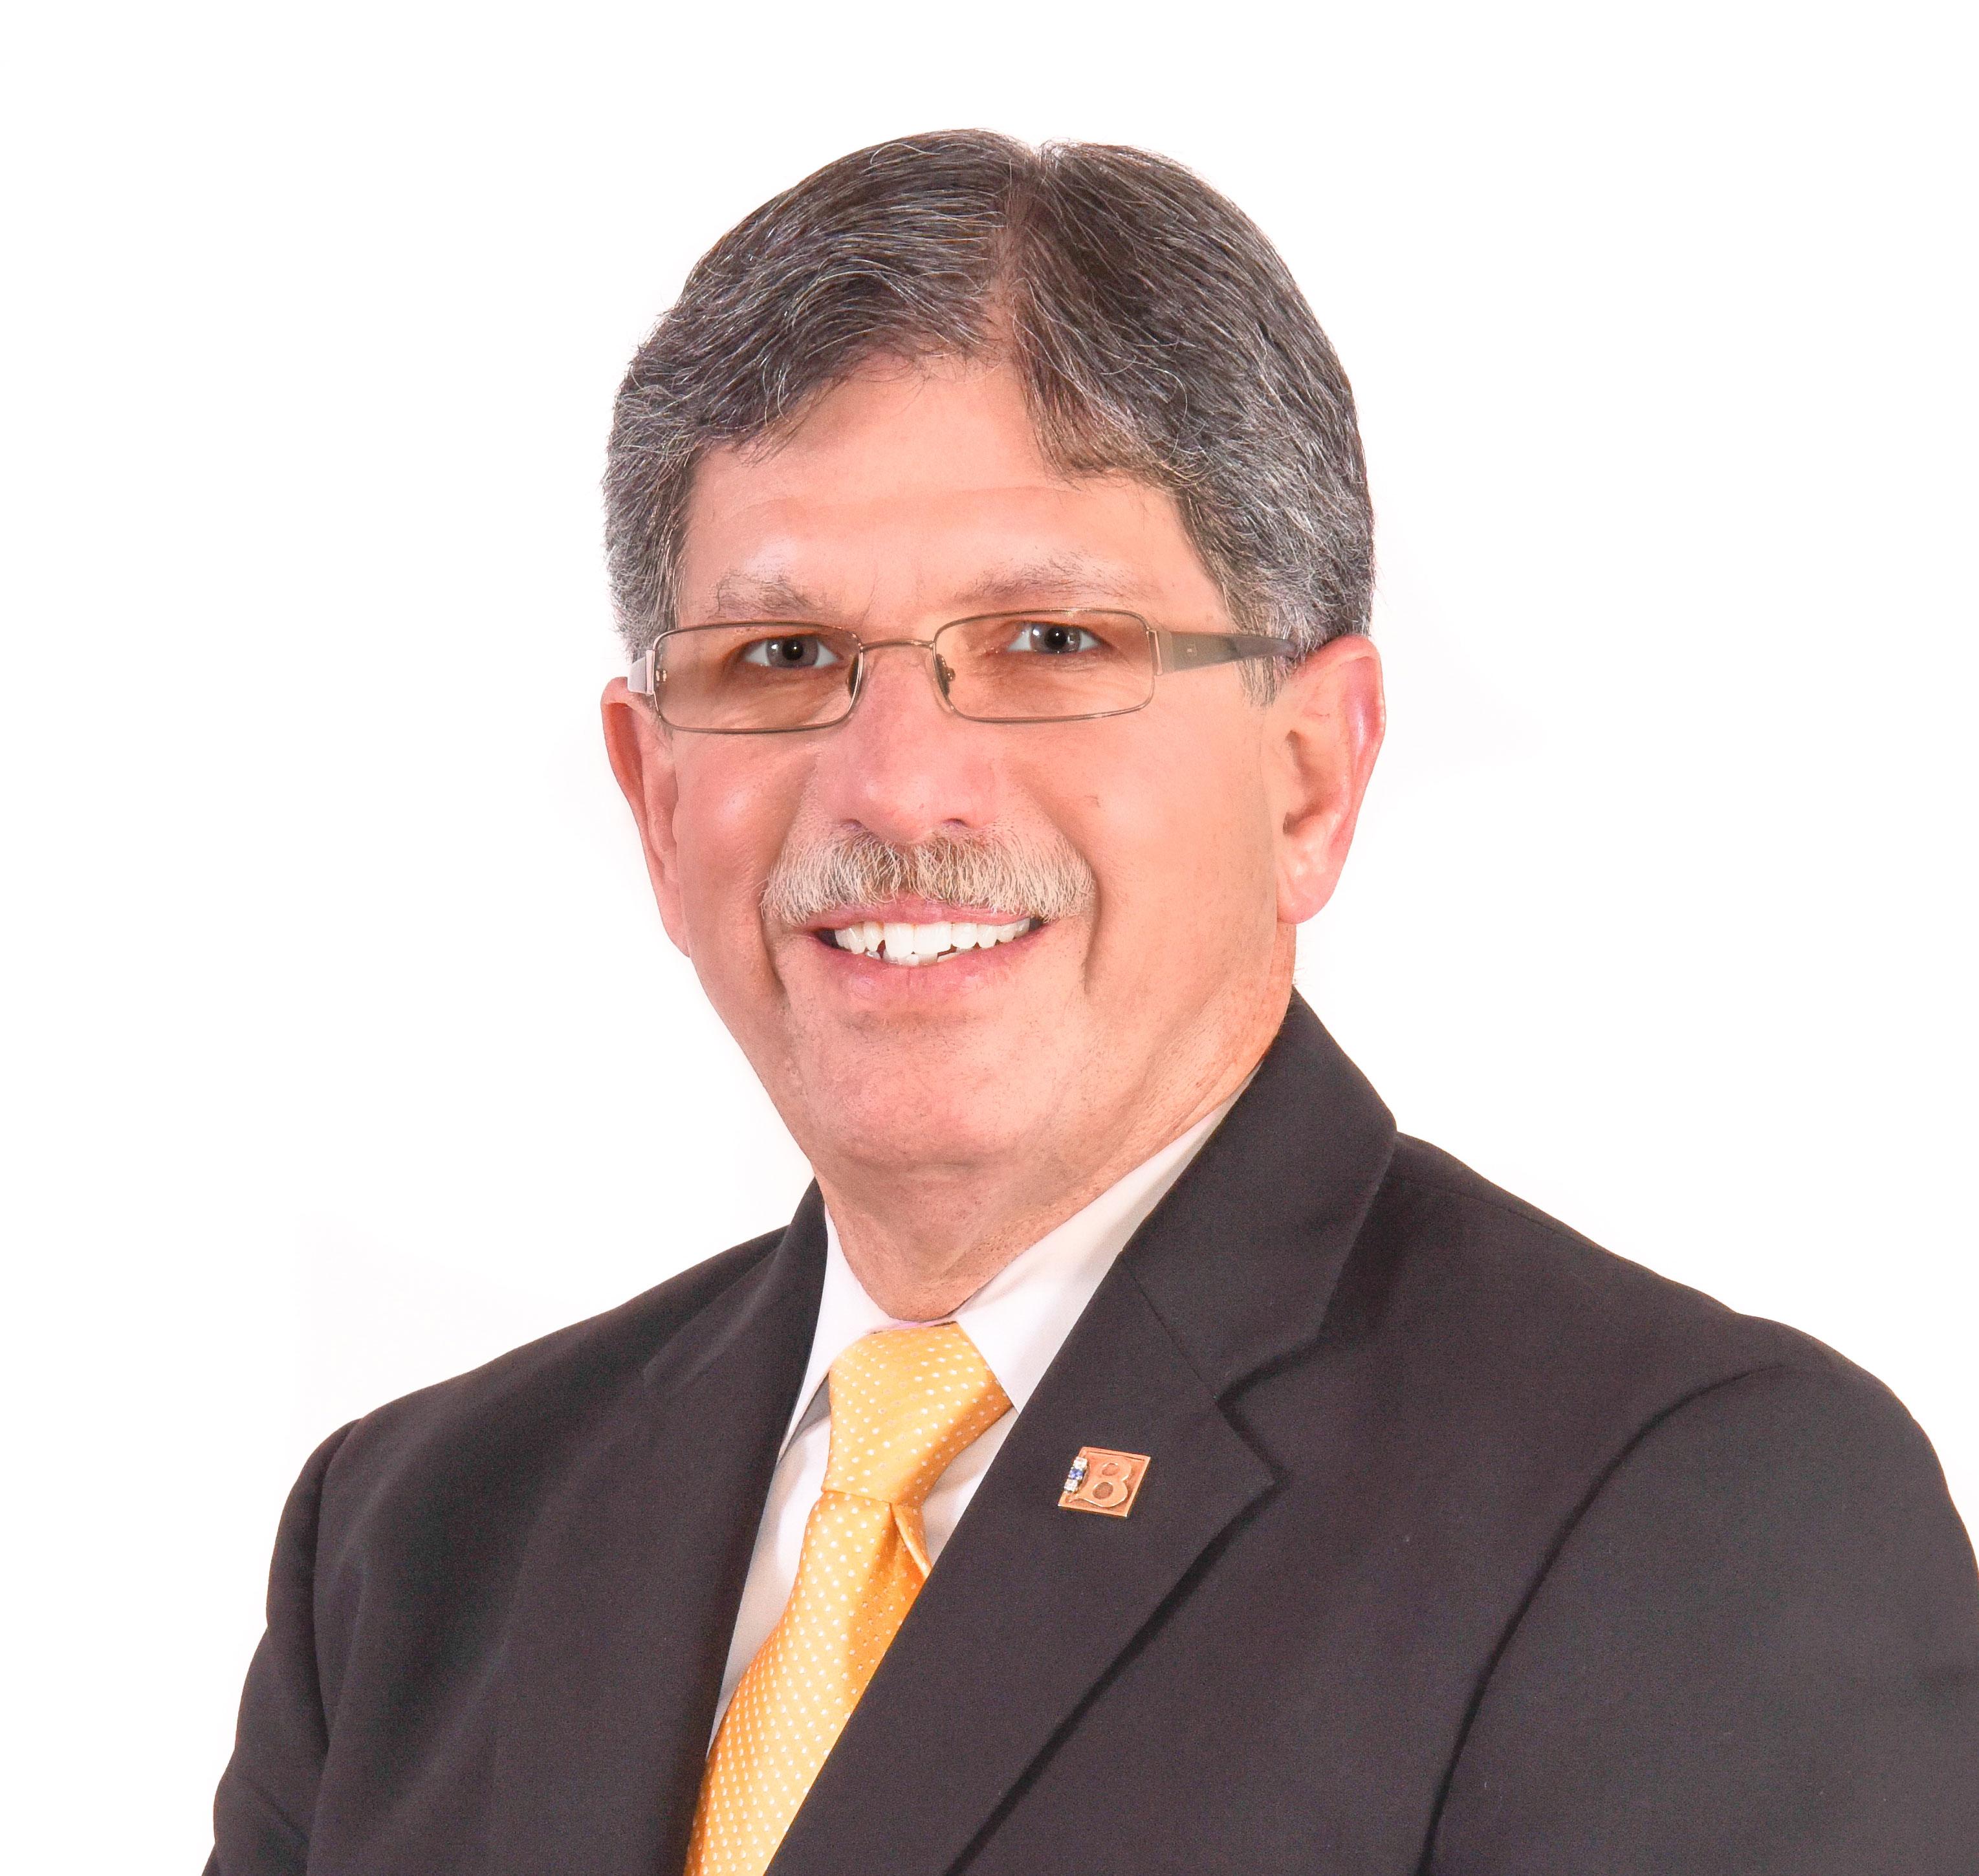 Pat Rankin, Funeral Director & Life Celebrant